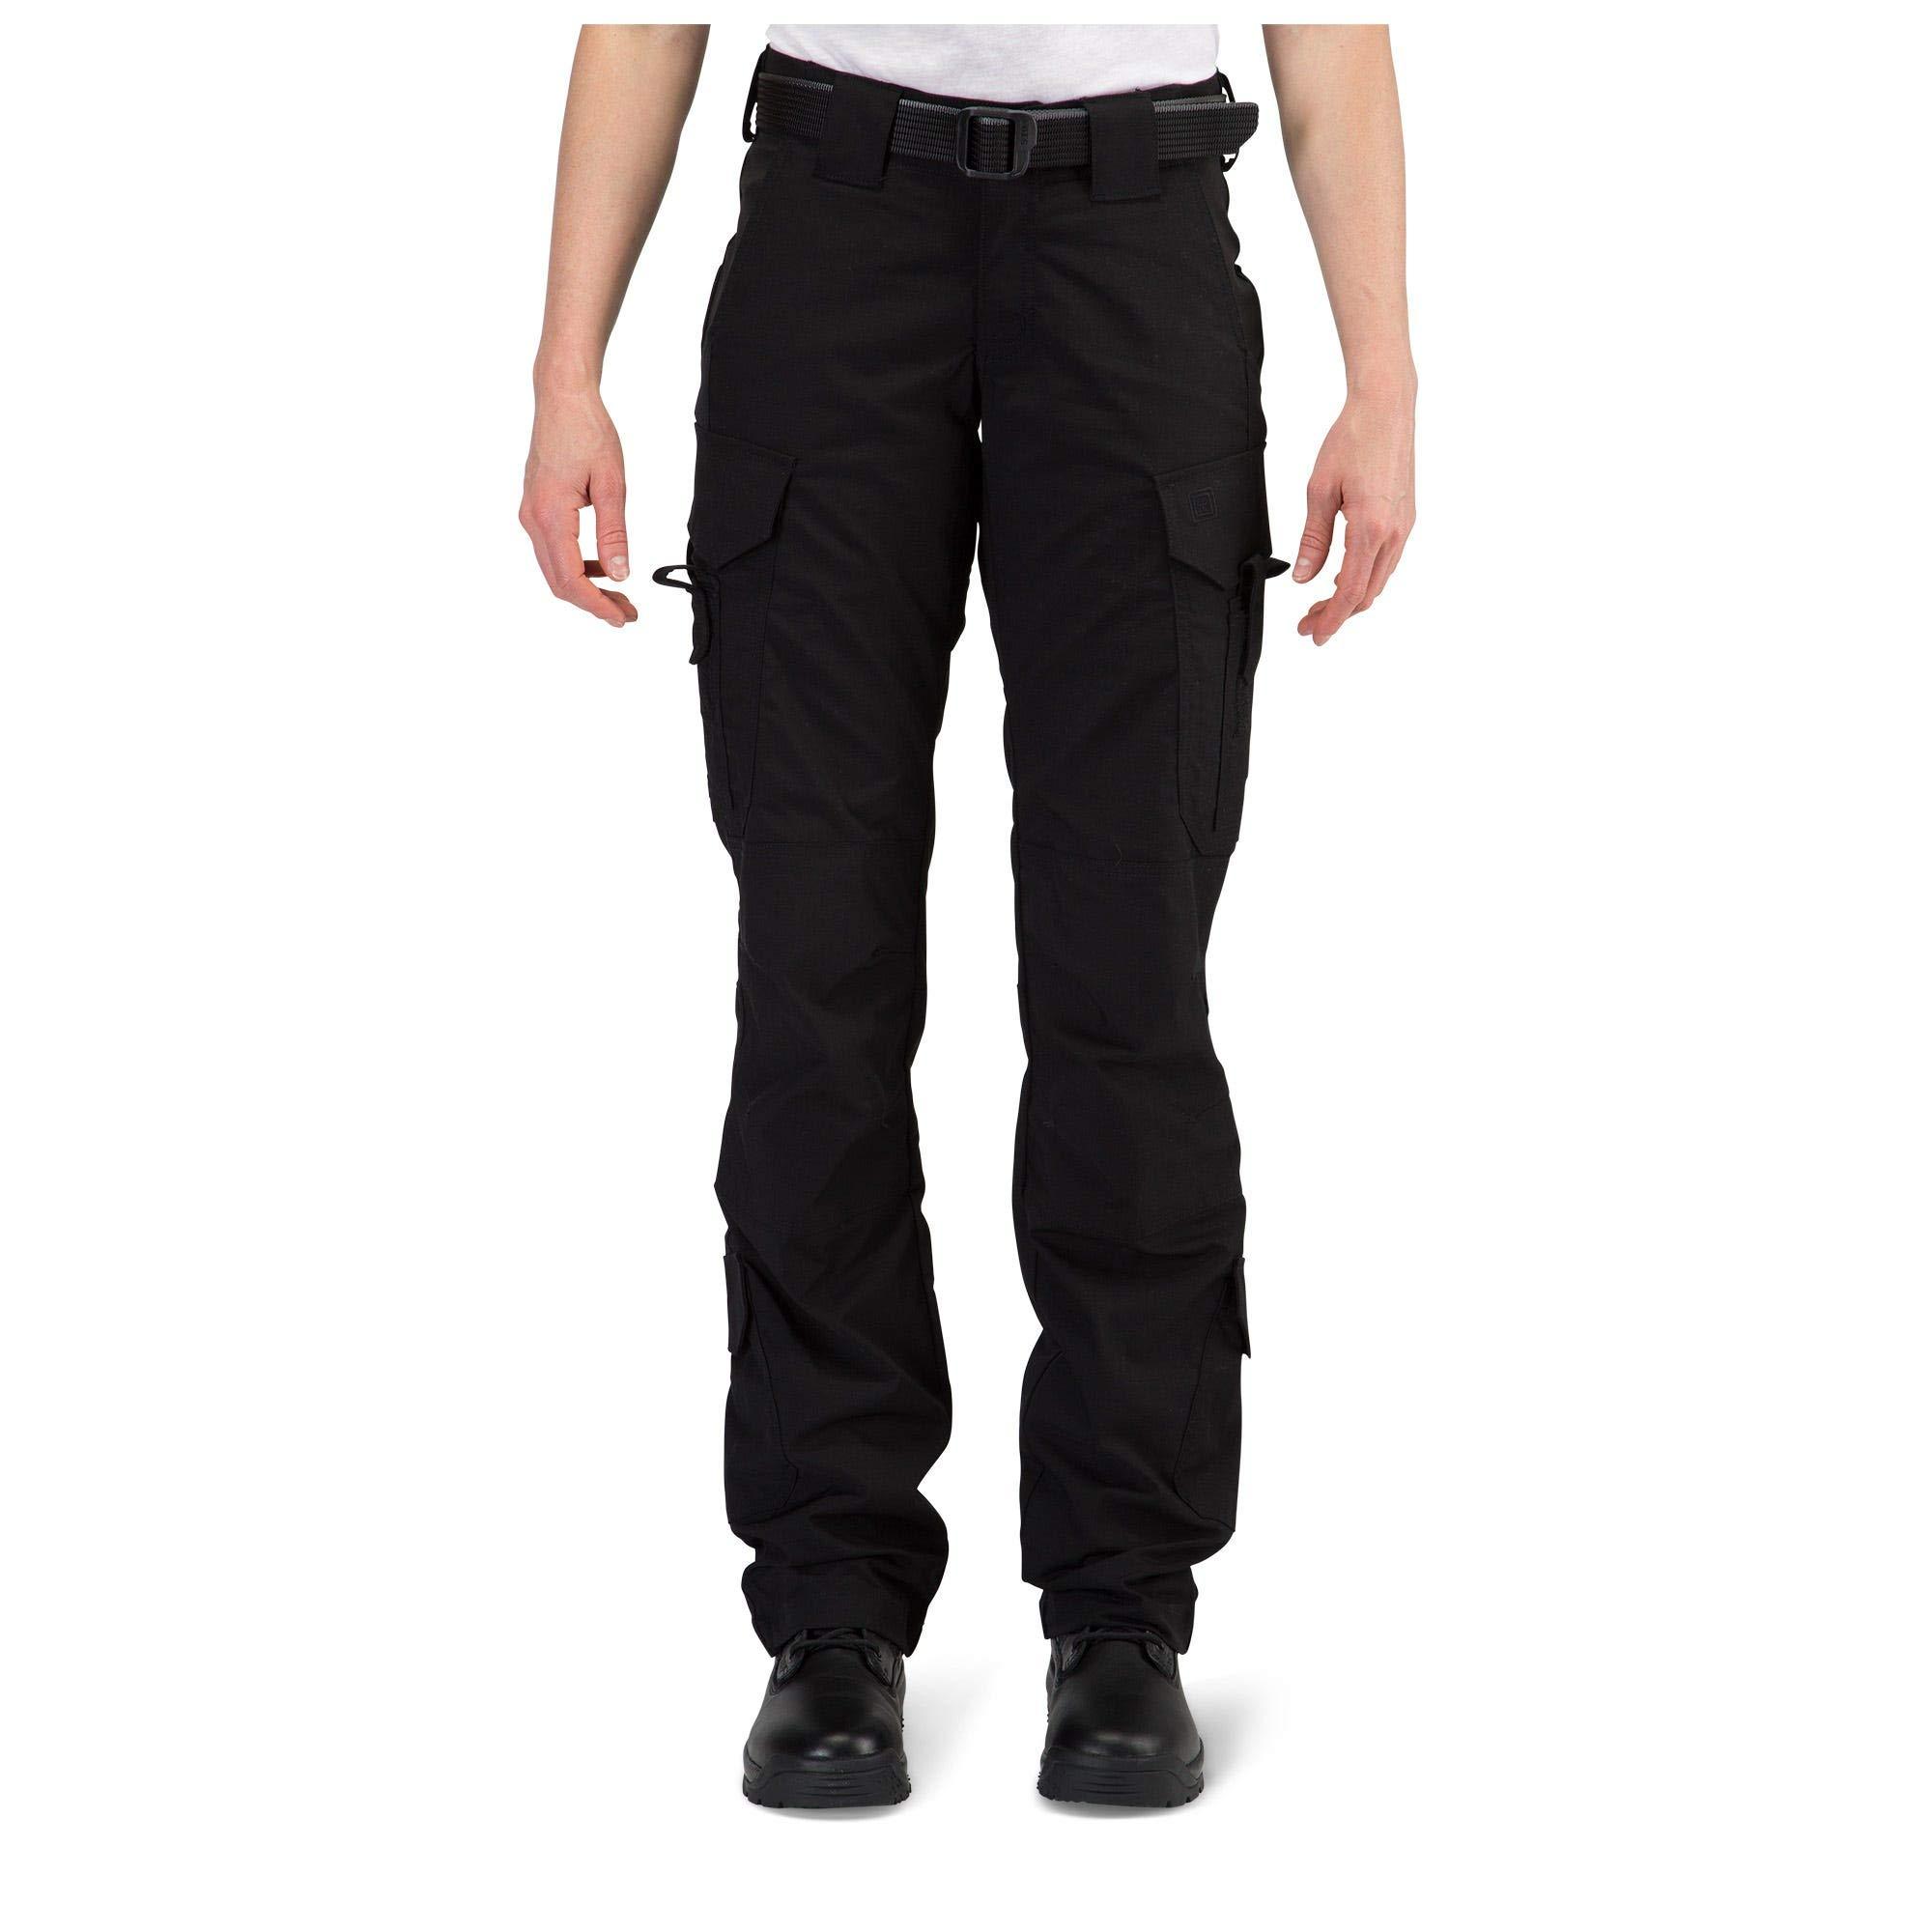 5.11 Tactical Women's Stryke EMS Pants Teflon Treated Fabric Internal Knee Pad Ready Style 64418